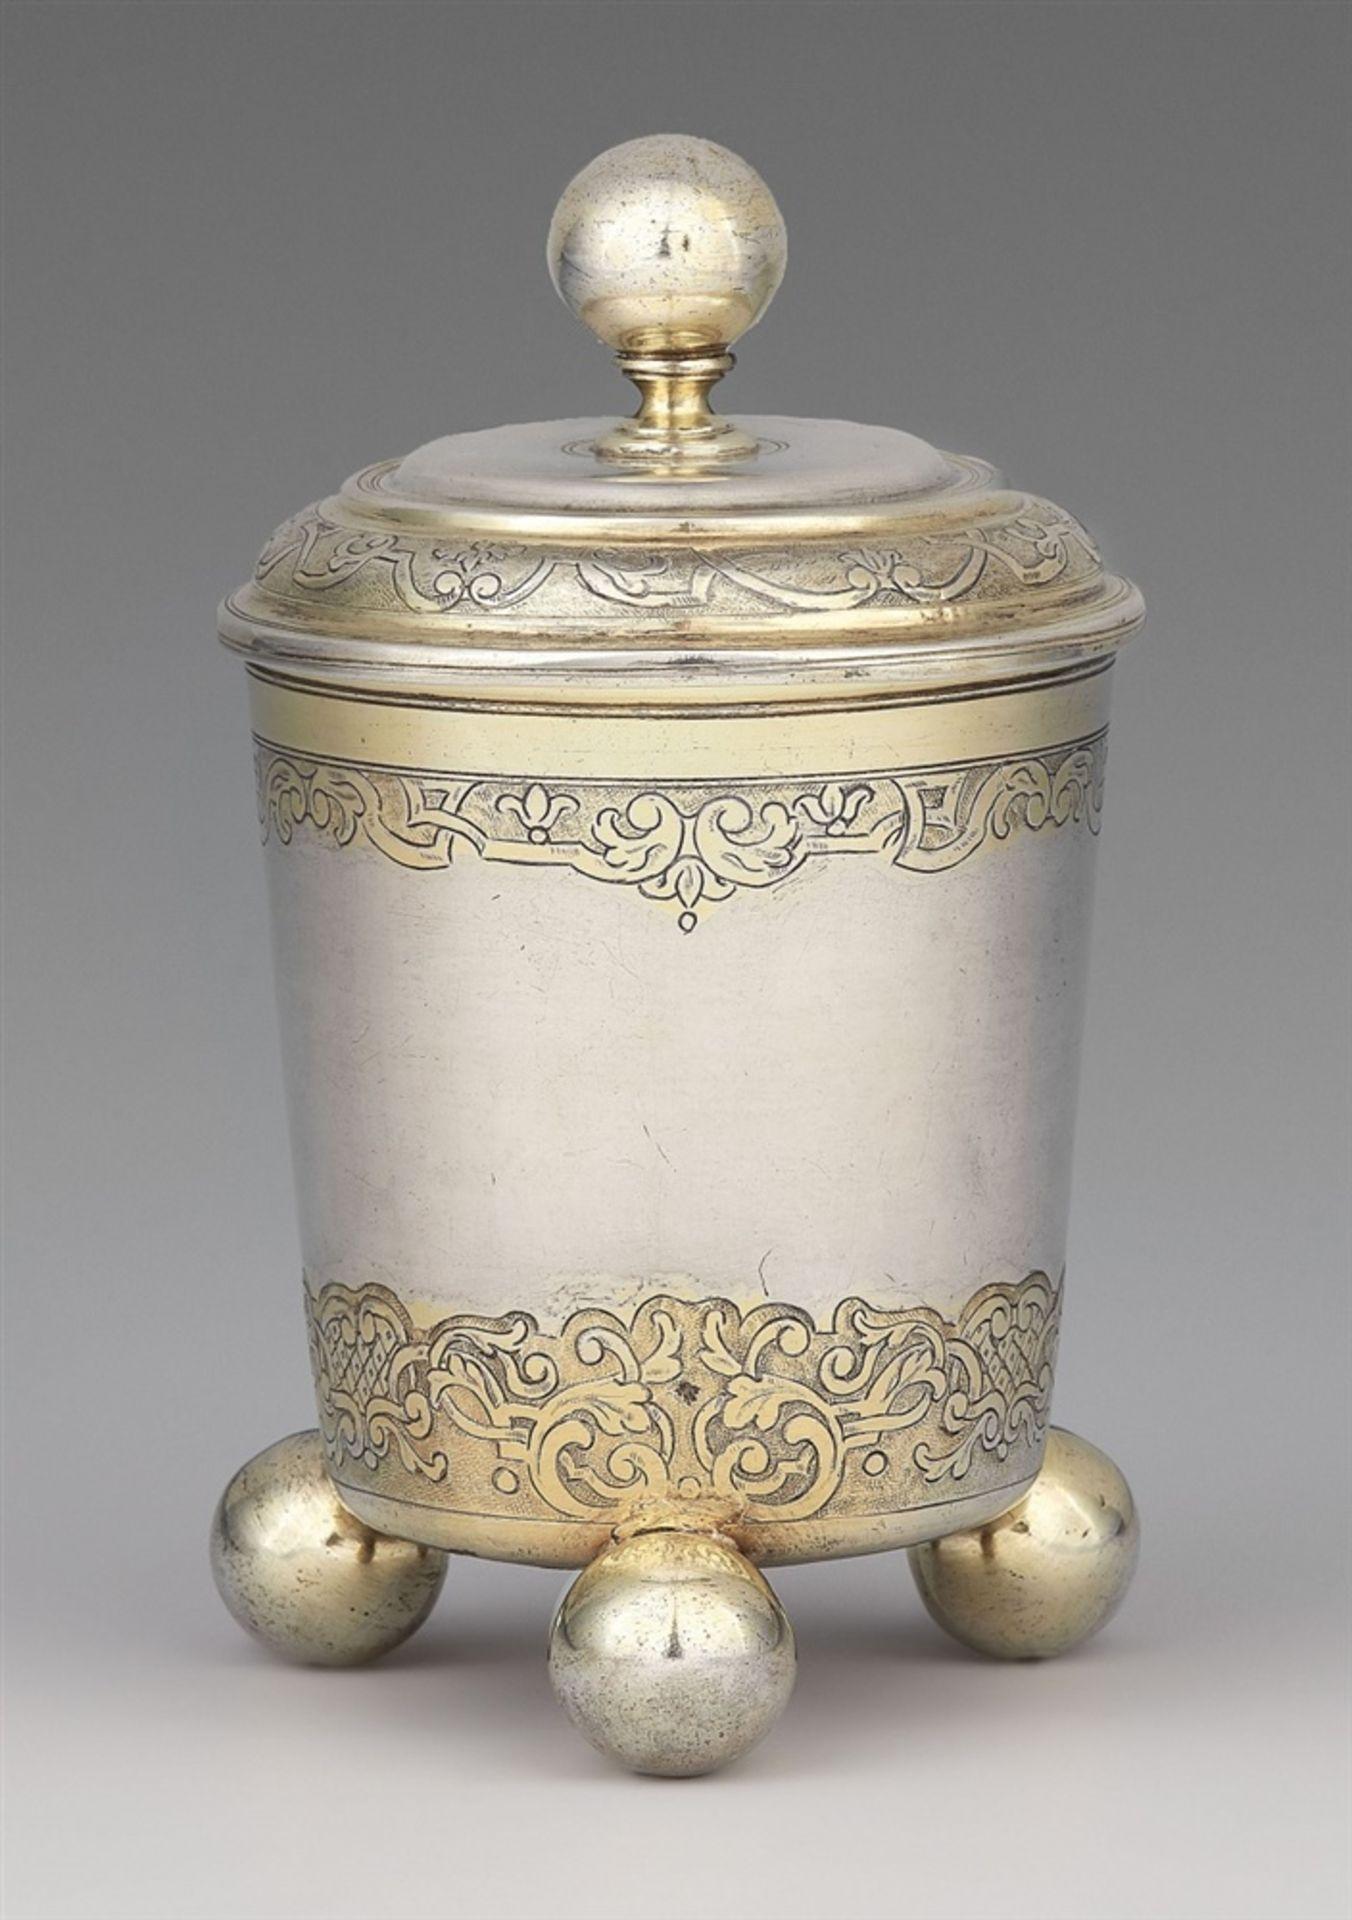 Los 725 - An Augsburg Règence silver beakerSilver; partly gilded. Parcel-gilt silver beaker on three spherical